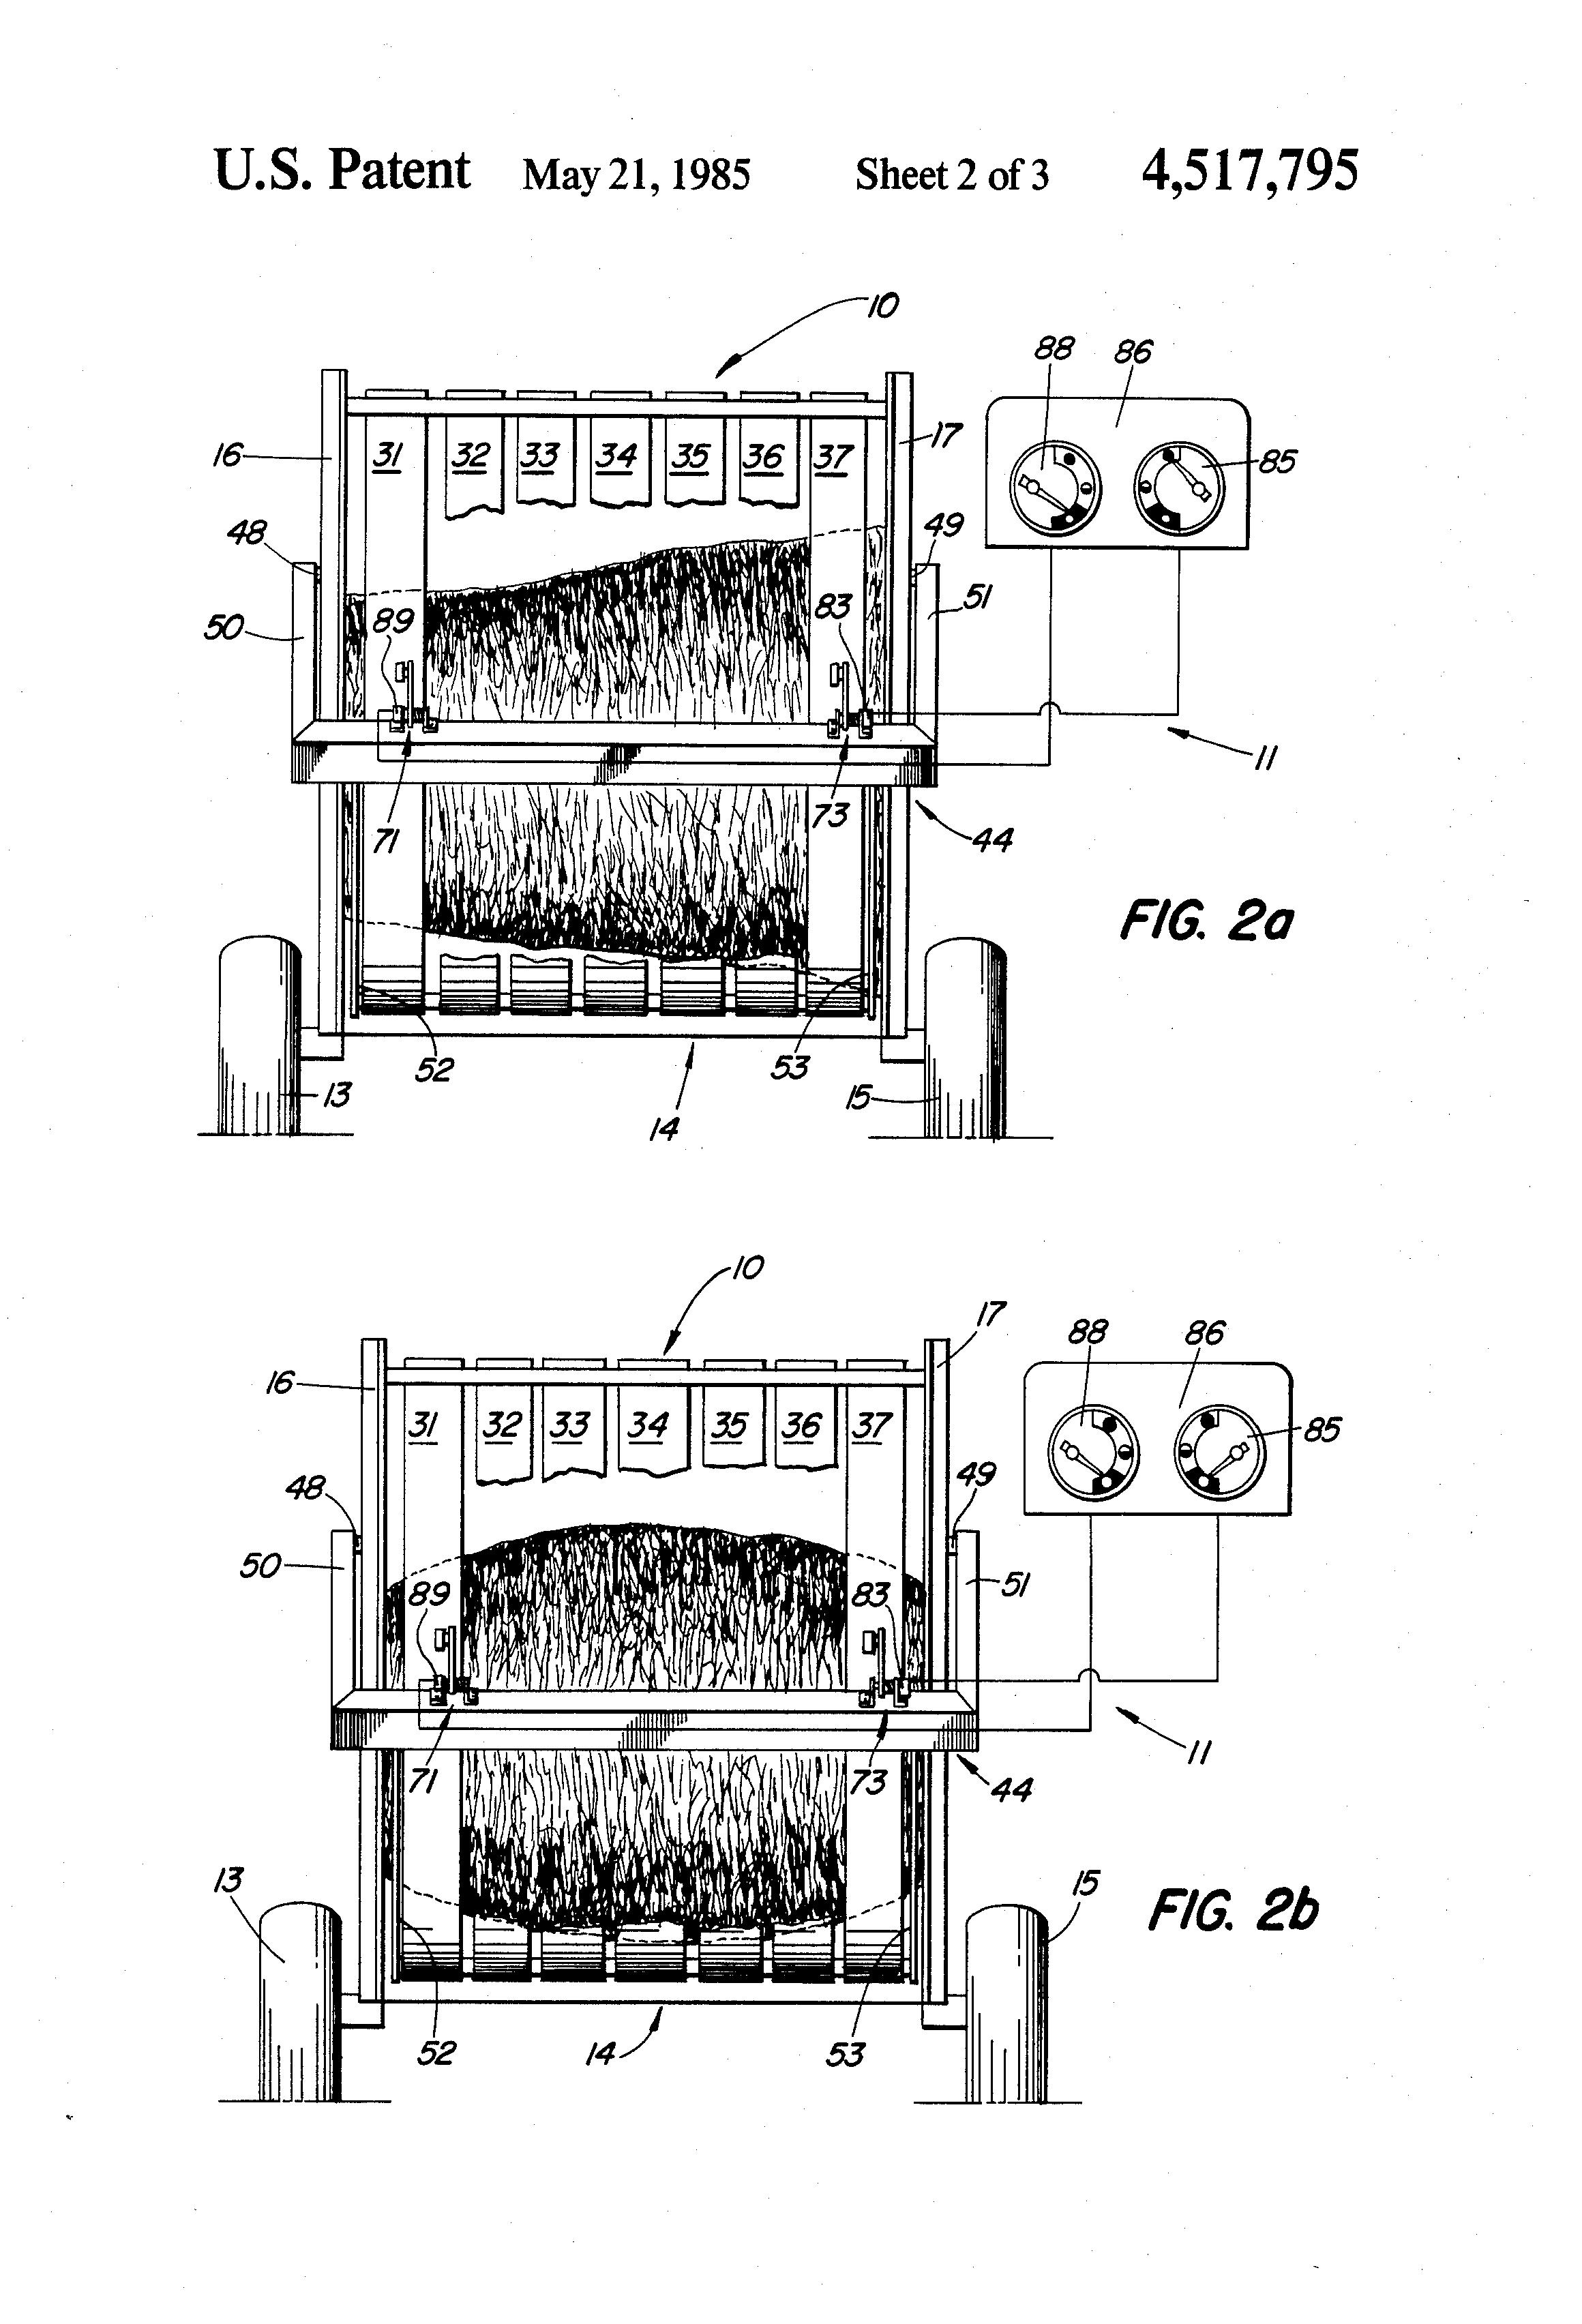 Brevet US4517795 - Bale-shape gauge for baler for forming